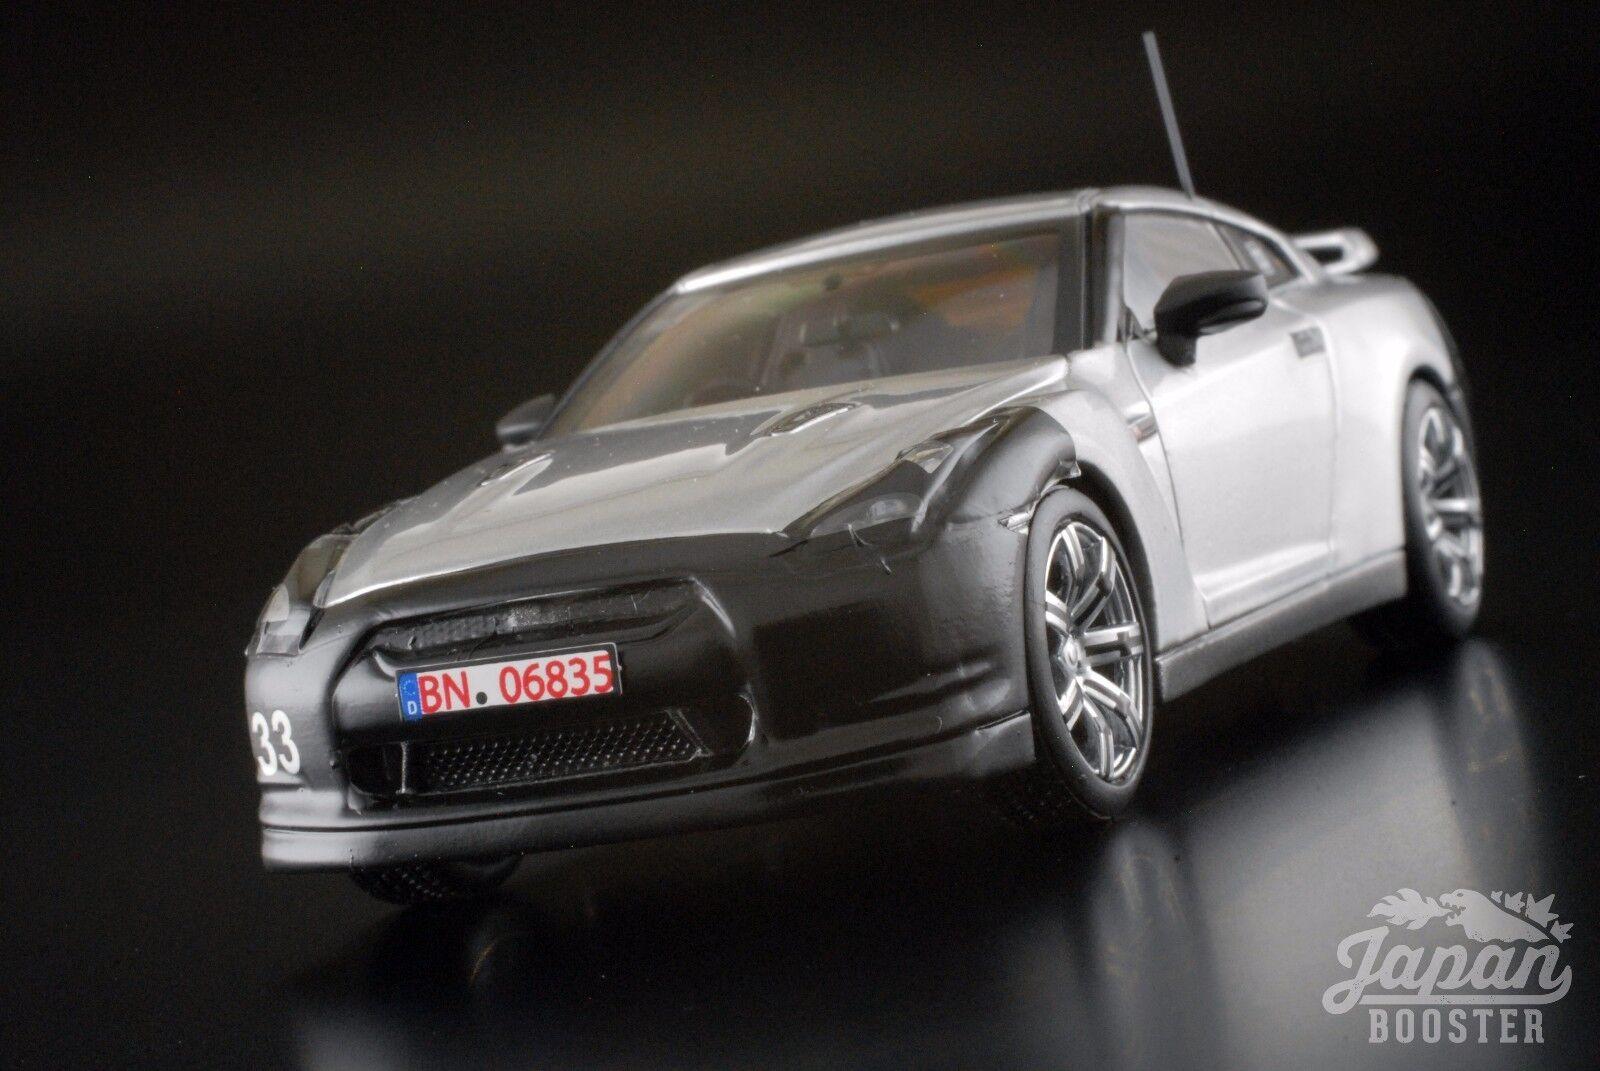 [KYOSHO ORIGINAL 1 43] Nissan GT-R R35 Nurburgring Test Car K03741NU